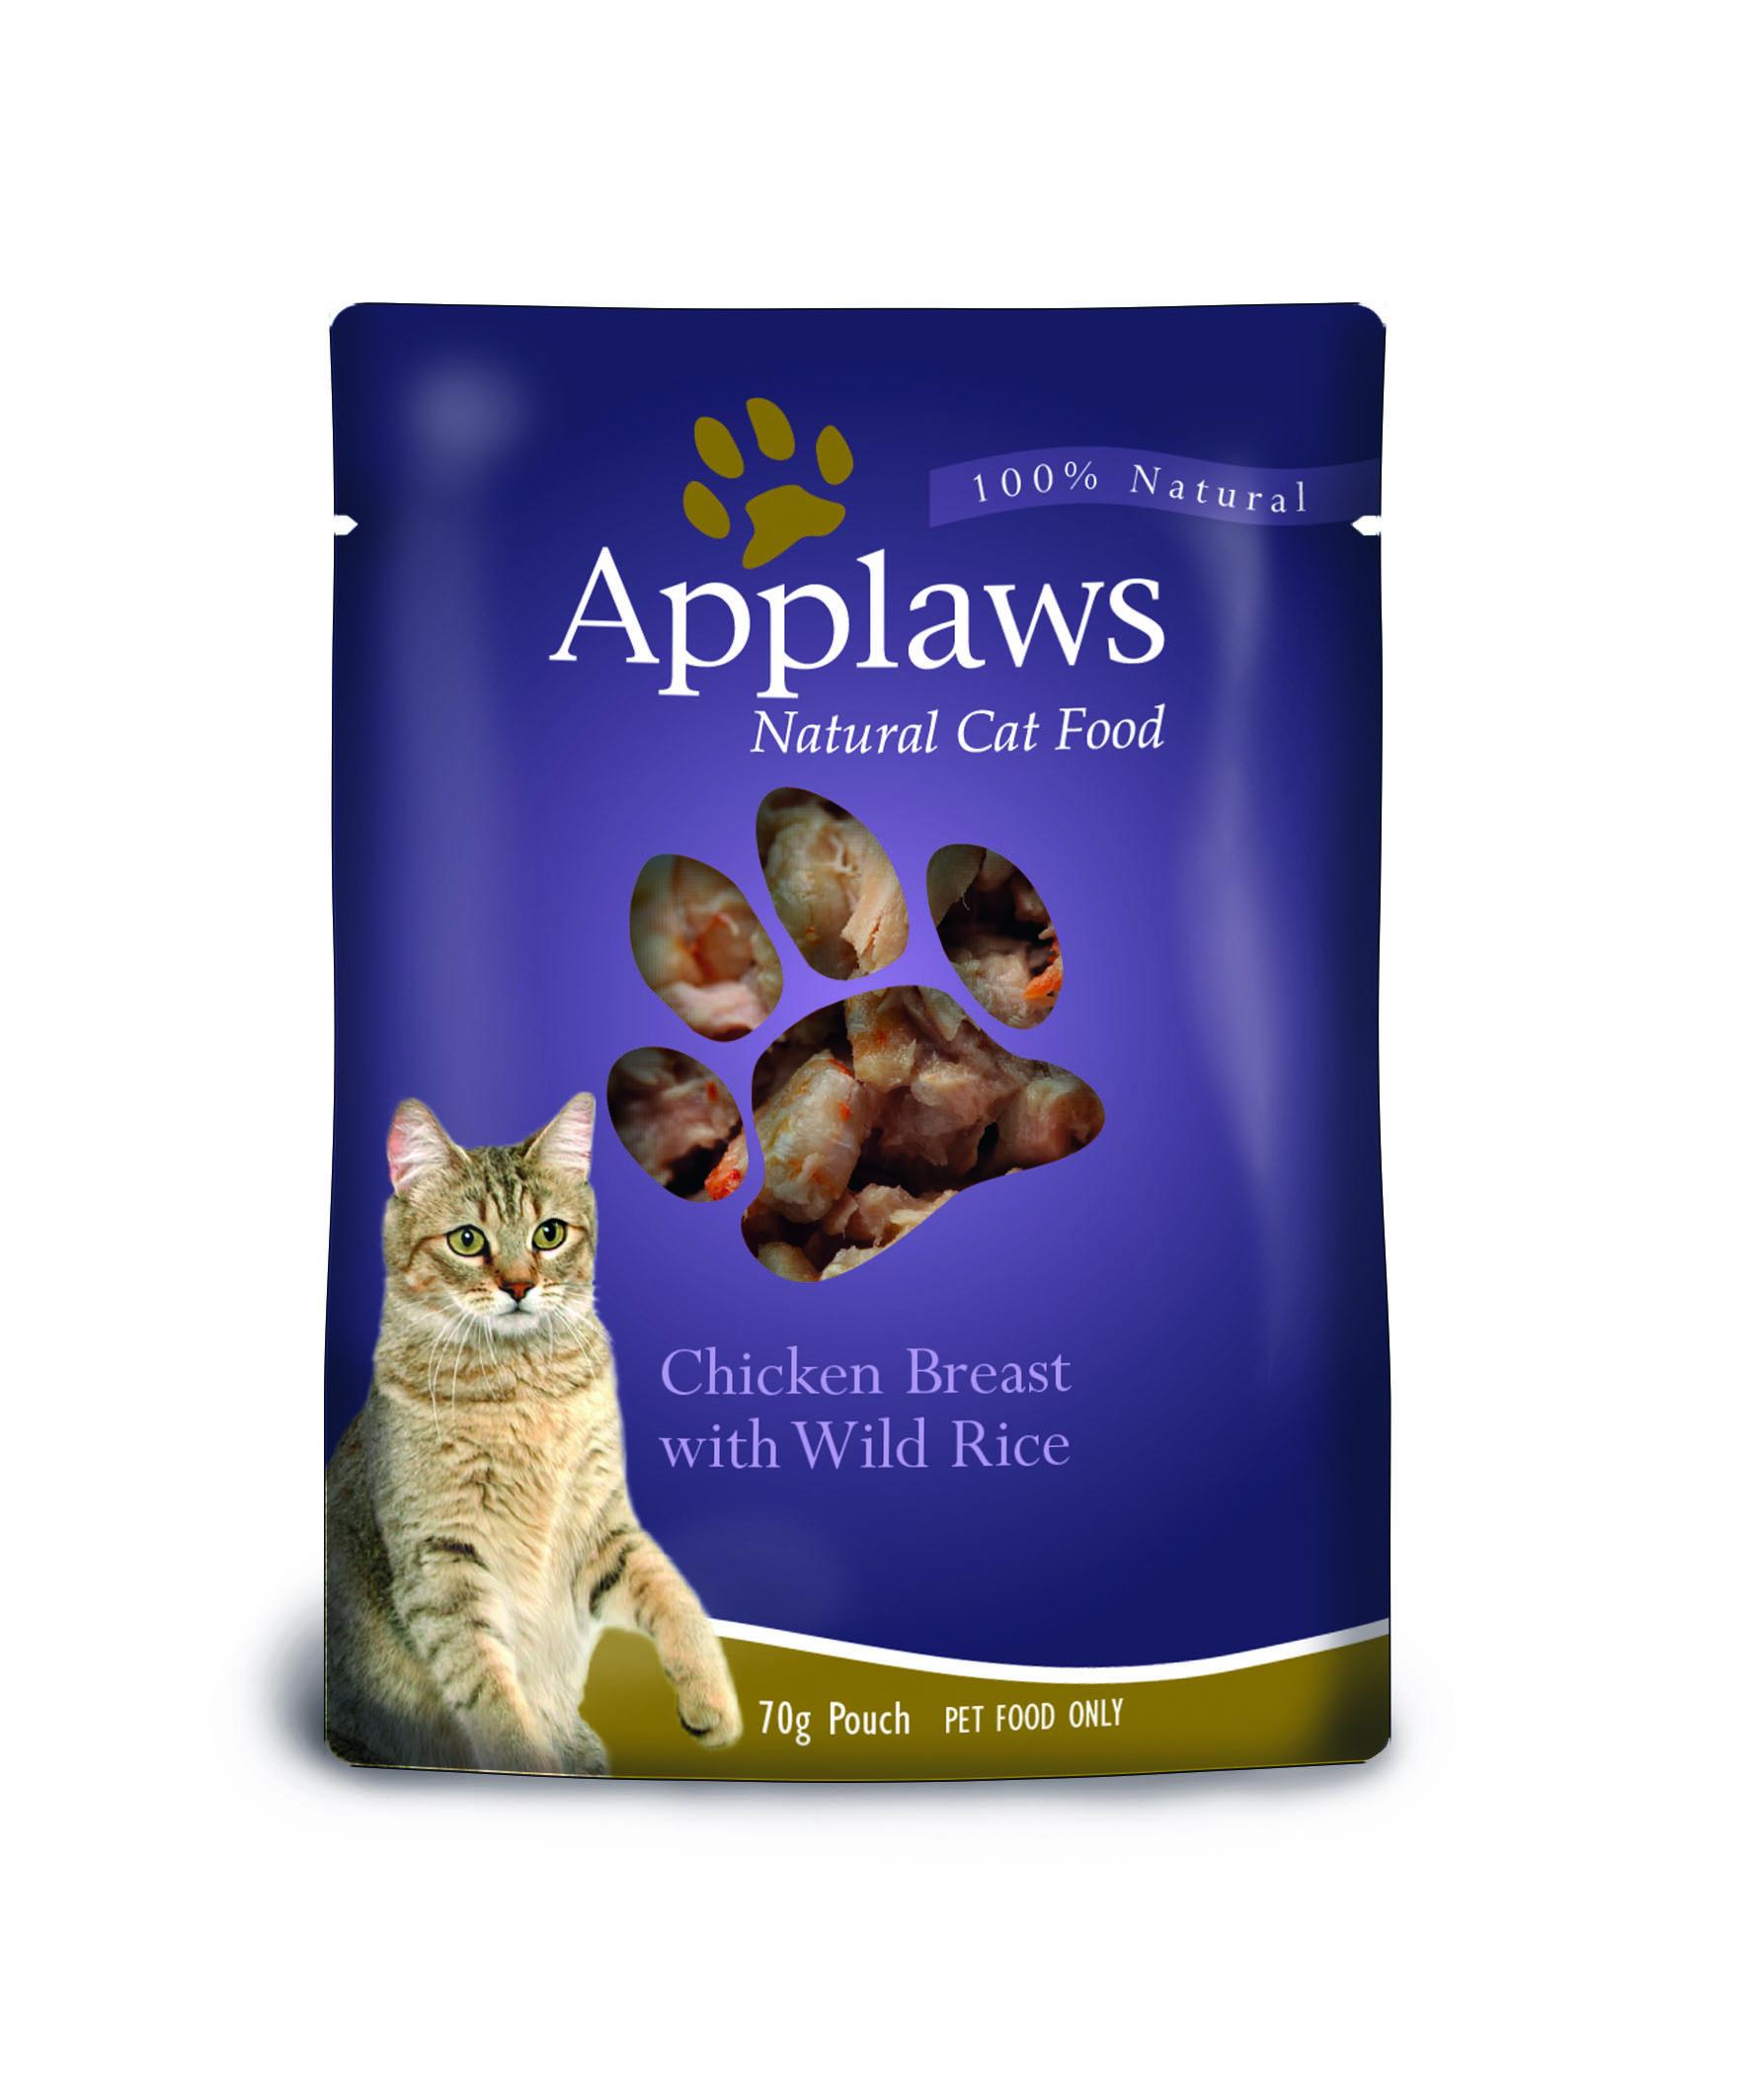 8007AU-AM Applaws Cat Pouch 70g Chicken Breast with Wild Rice HR